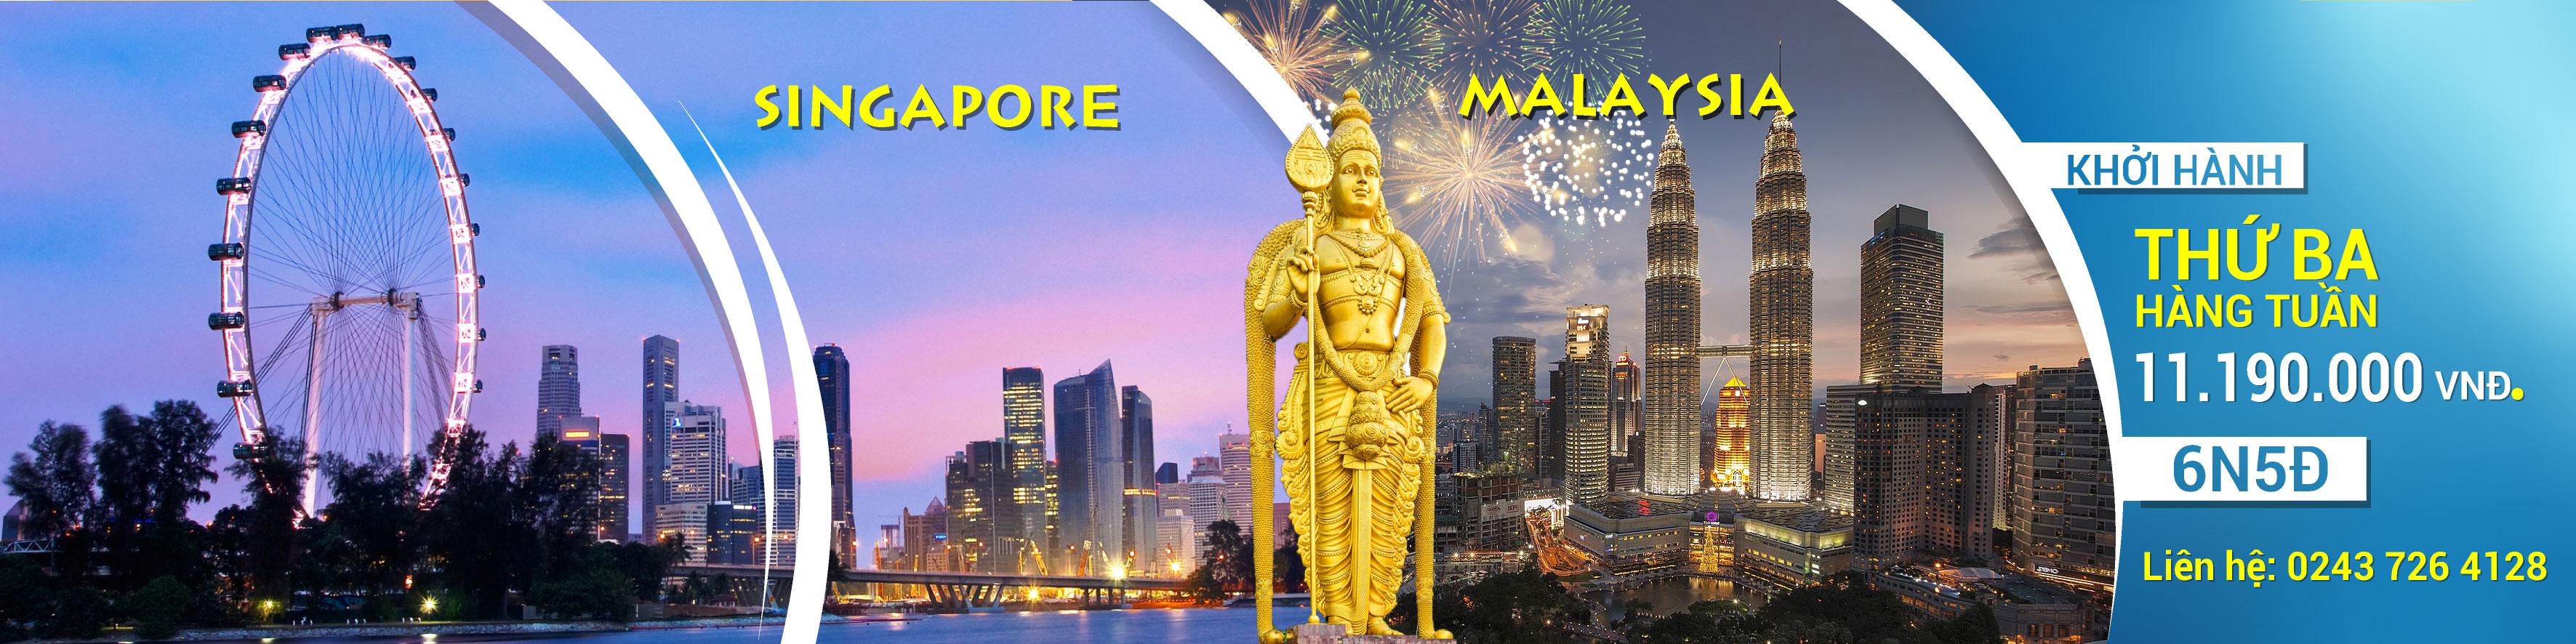 http://miendongduong.com/ha-noi-singapore-malaysia-ha-noi-6n5d